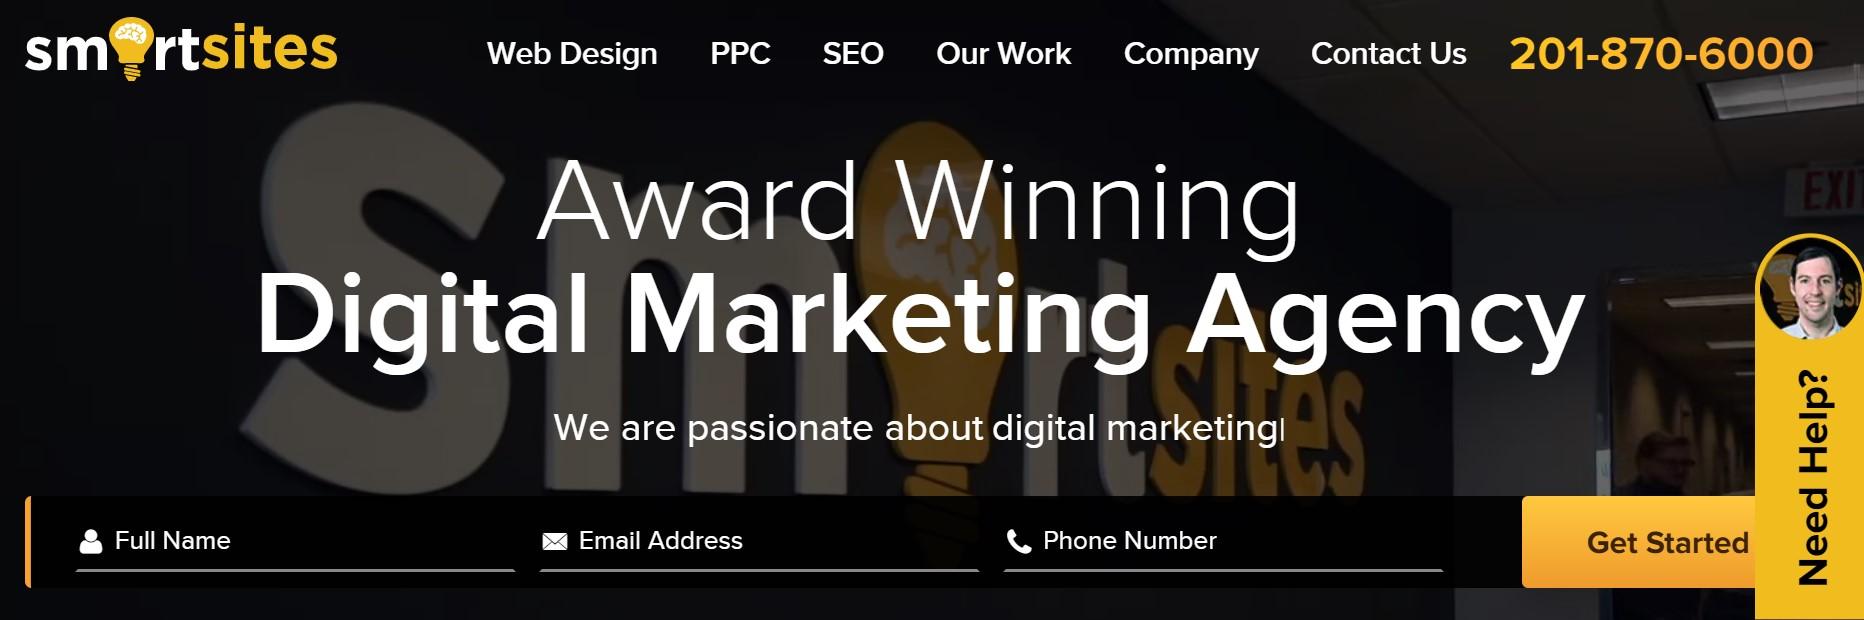 smartsites-top-digital-marketing-agencies